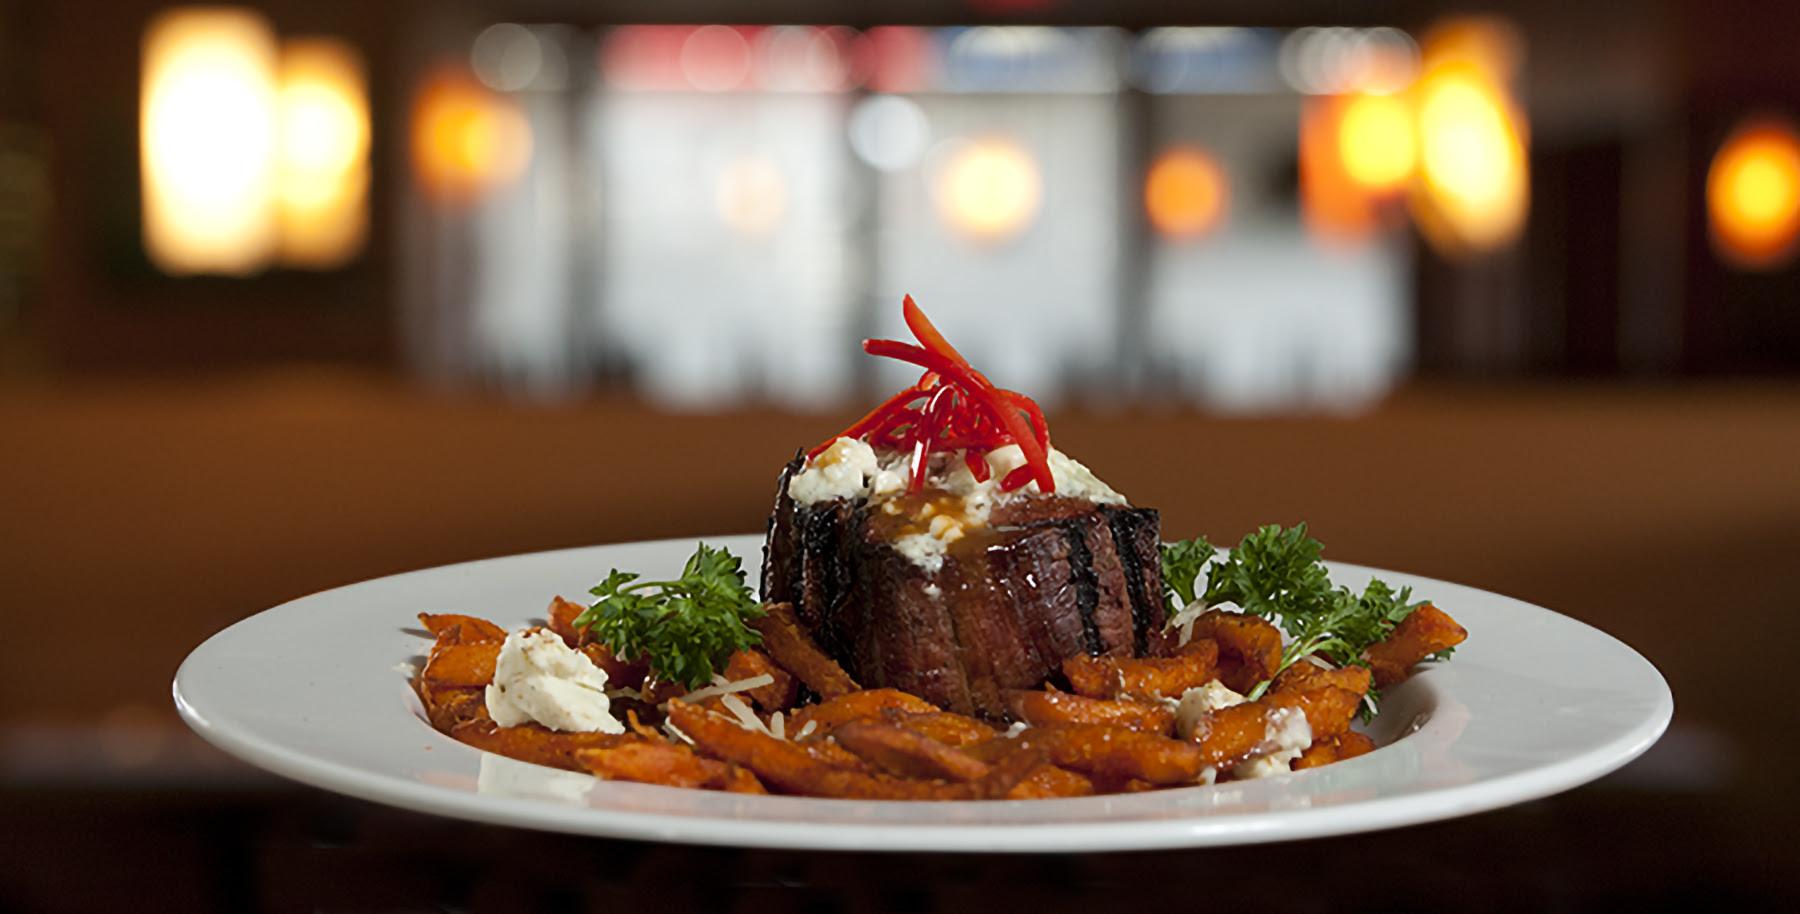 Professional Restaurant Food Photography